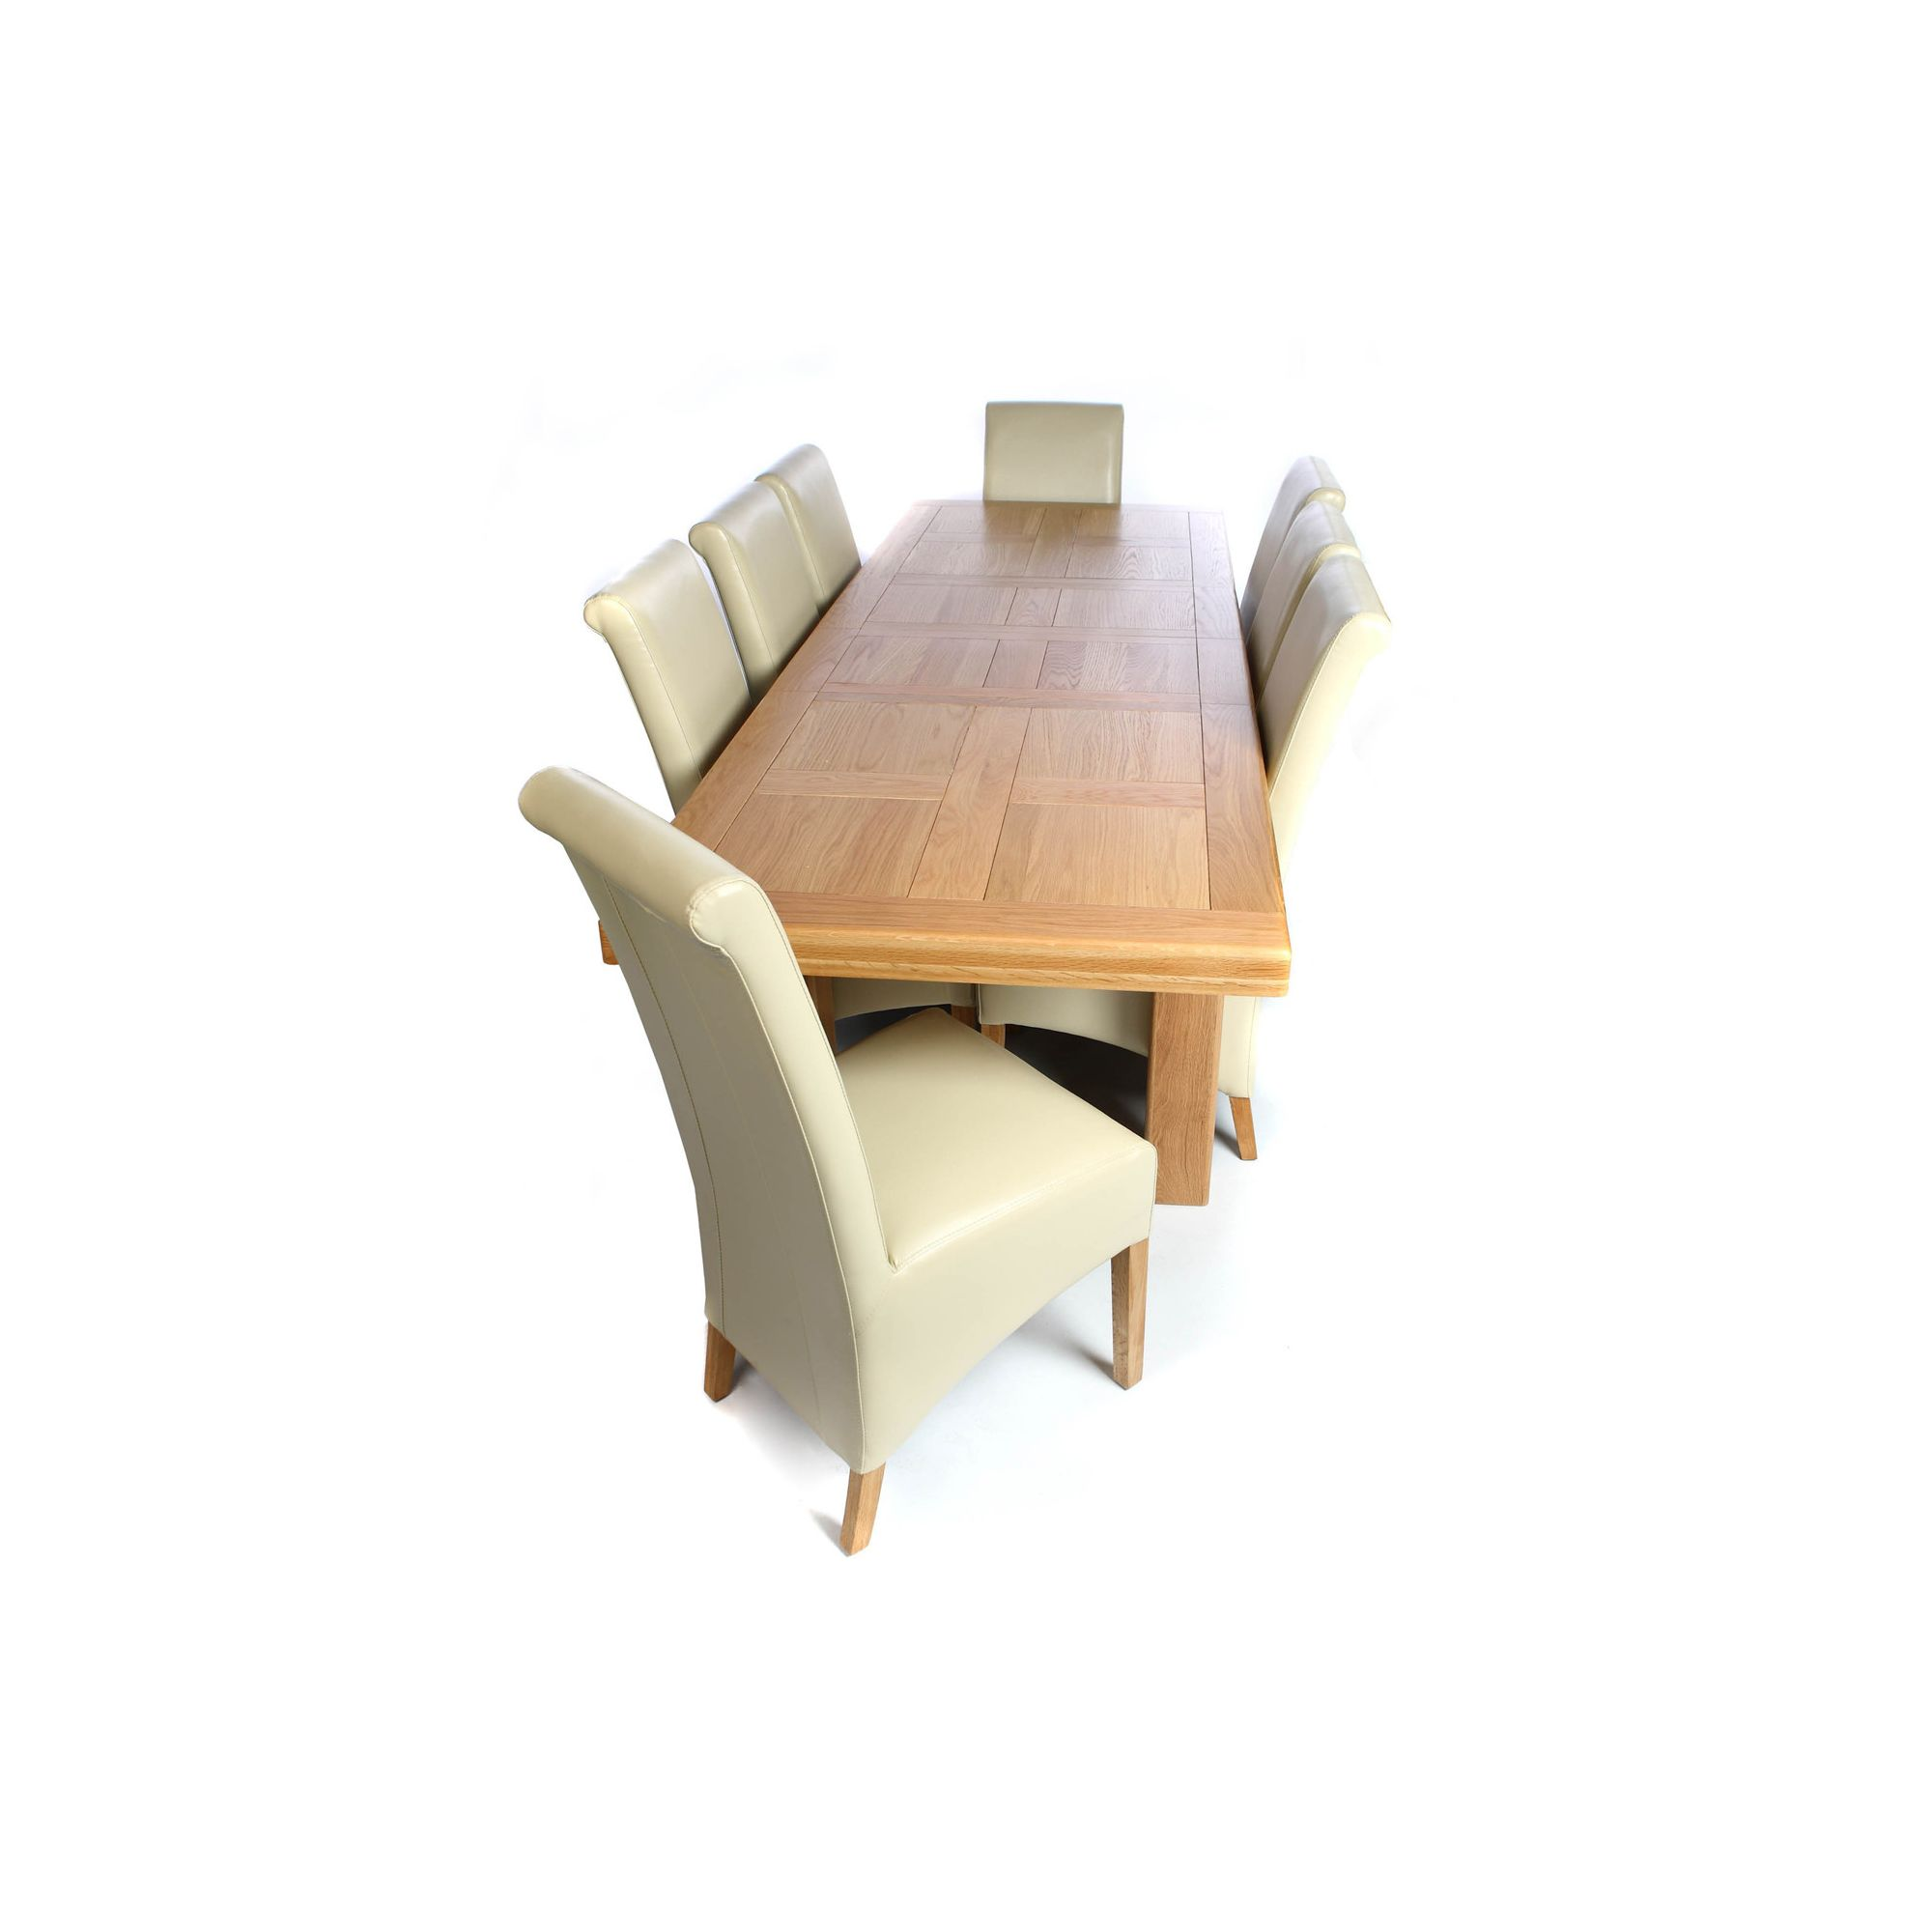 Shankar Enterprises Grand Marseille Extending Dining Table - Natural Oak - 180cm/260cm W x 90cm D